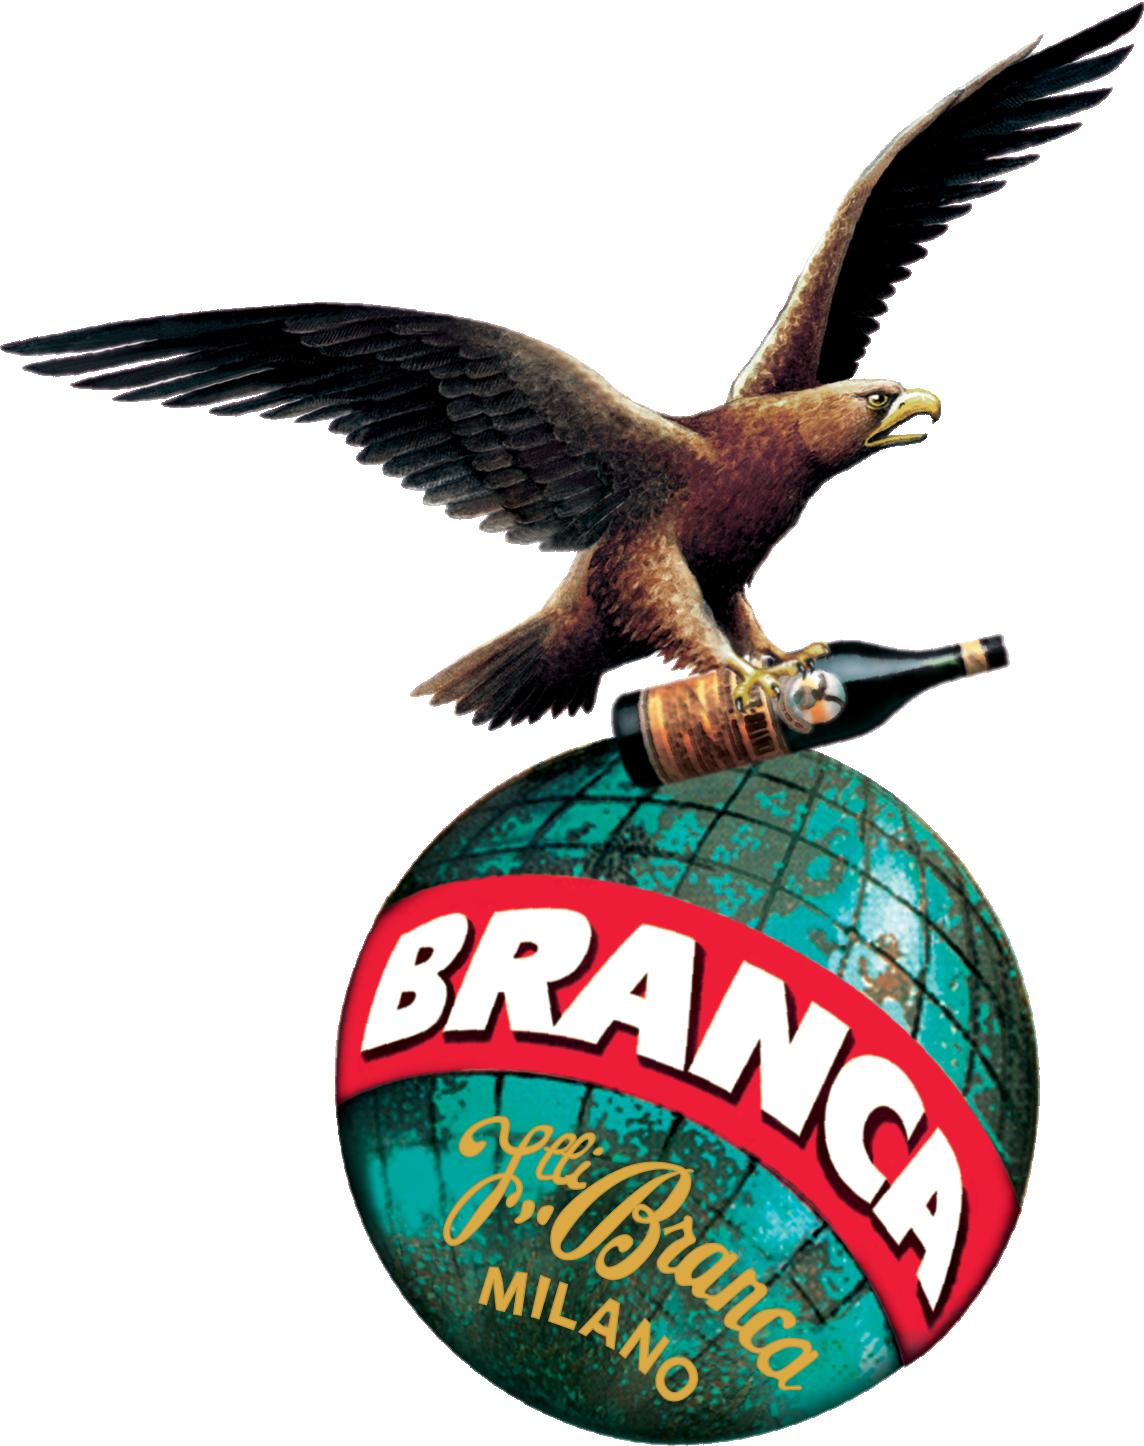 Fernet-Branca Eagle & Globe - Picture - Anita Barrera.png